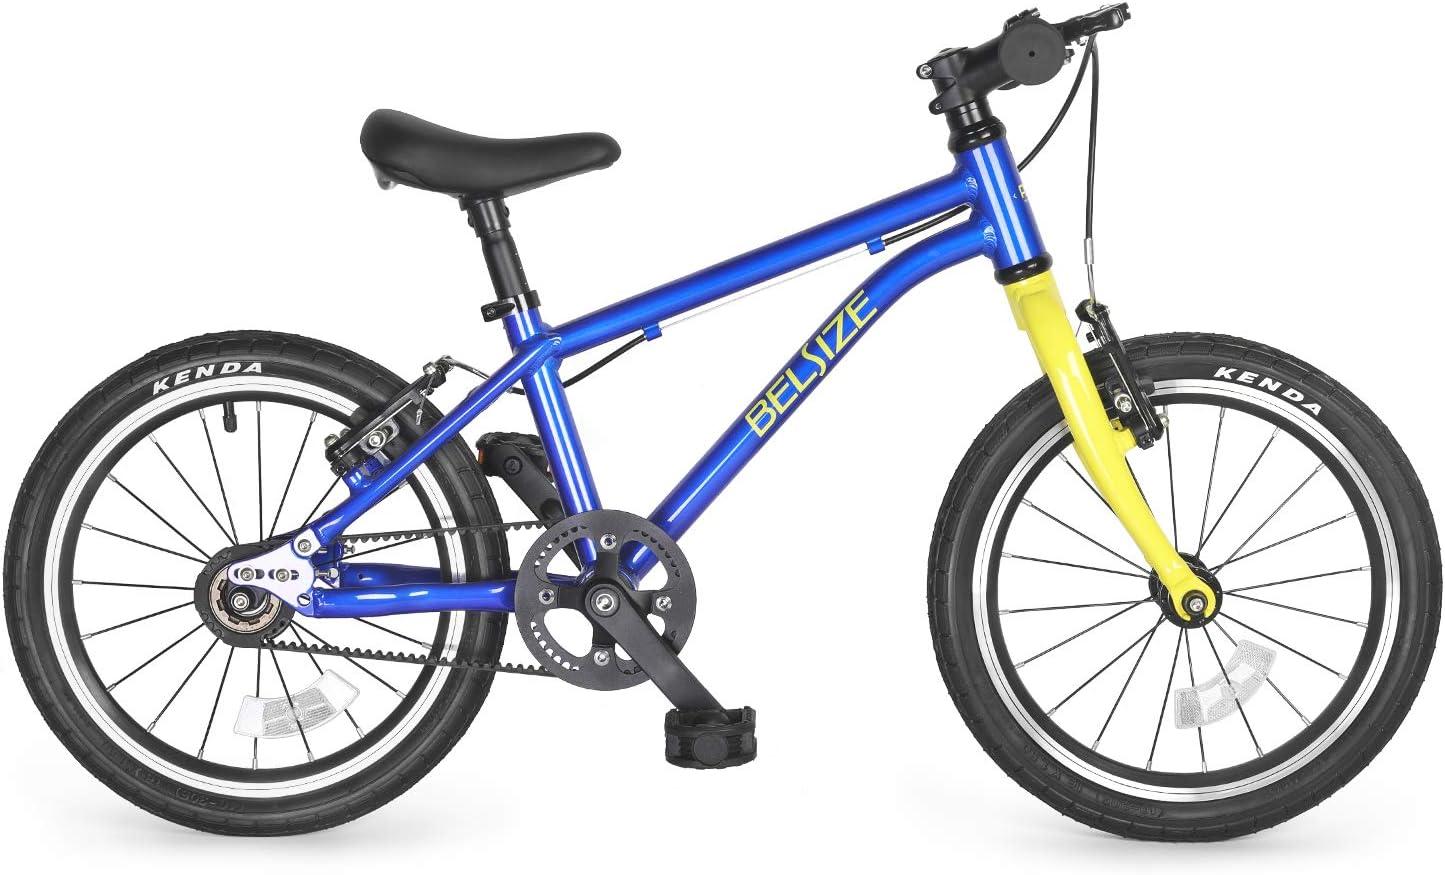 A11N SPORTS BELSIZE BLZ16 16″ Luxury Belt Drive Lightweight Aluminium Alloy Kid's Bike